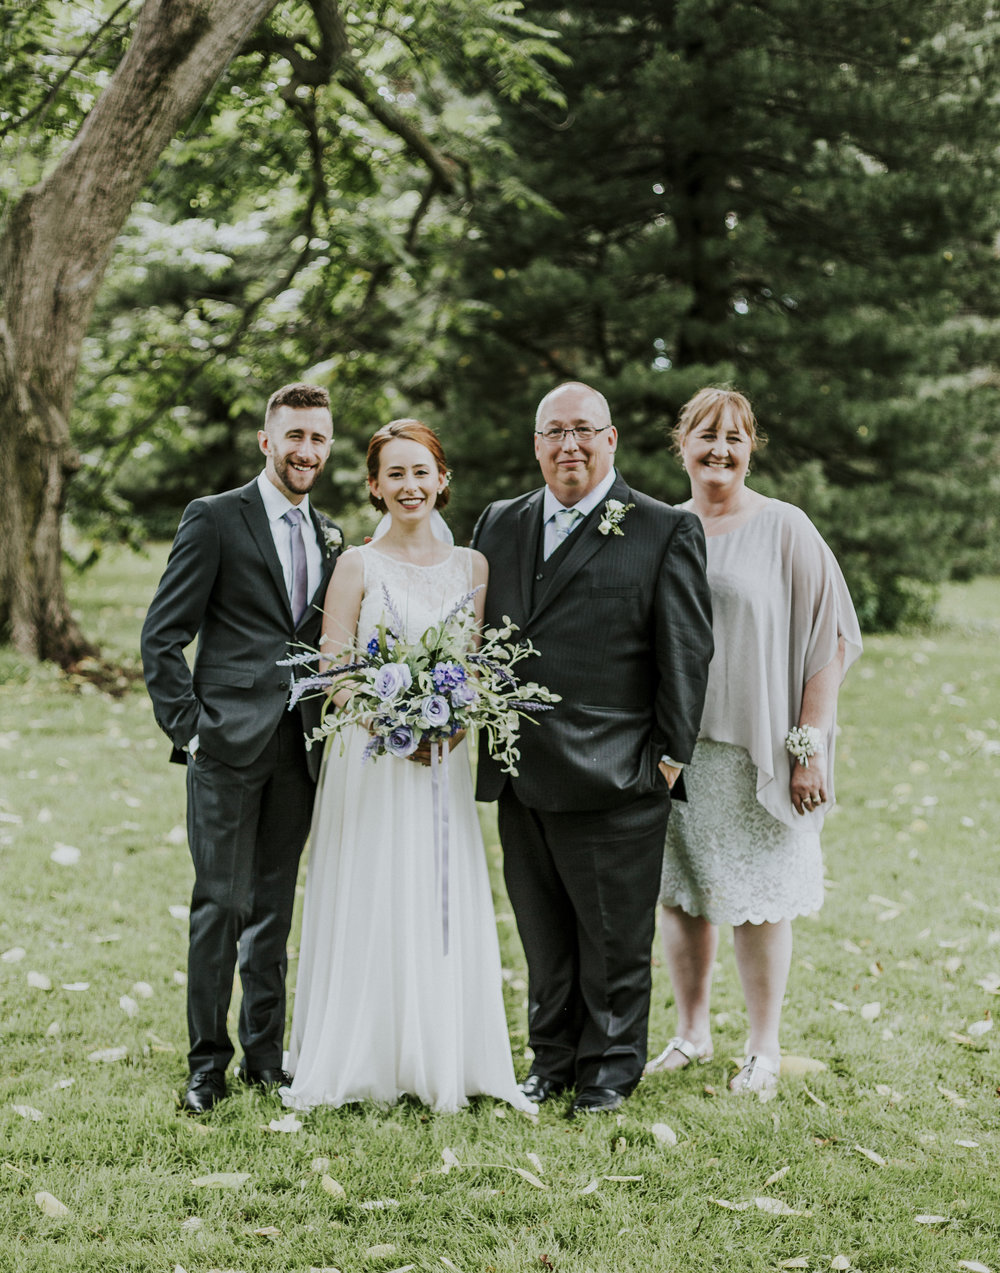 FORMALS + WEDDING PARTY-002.jpg